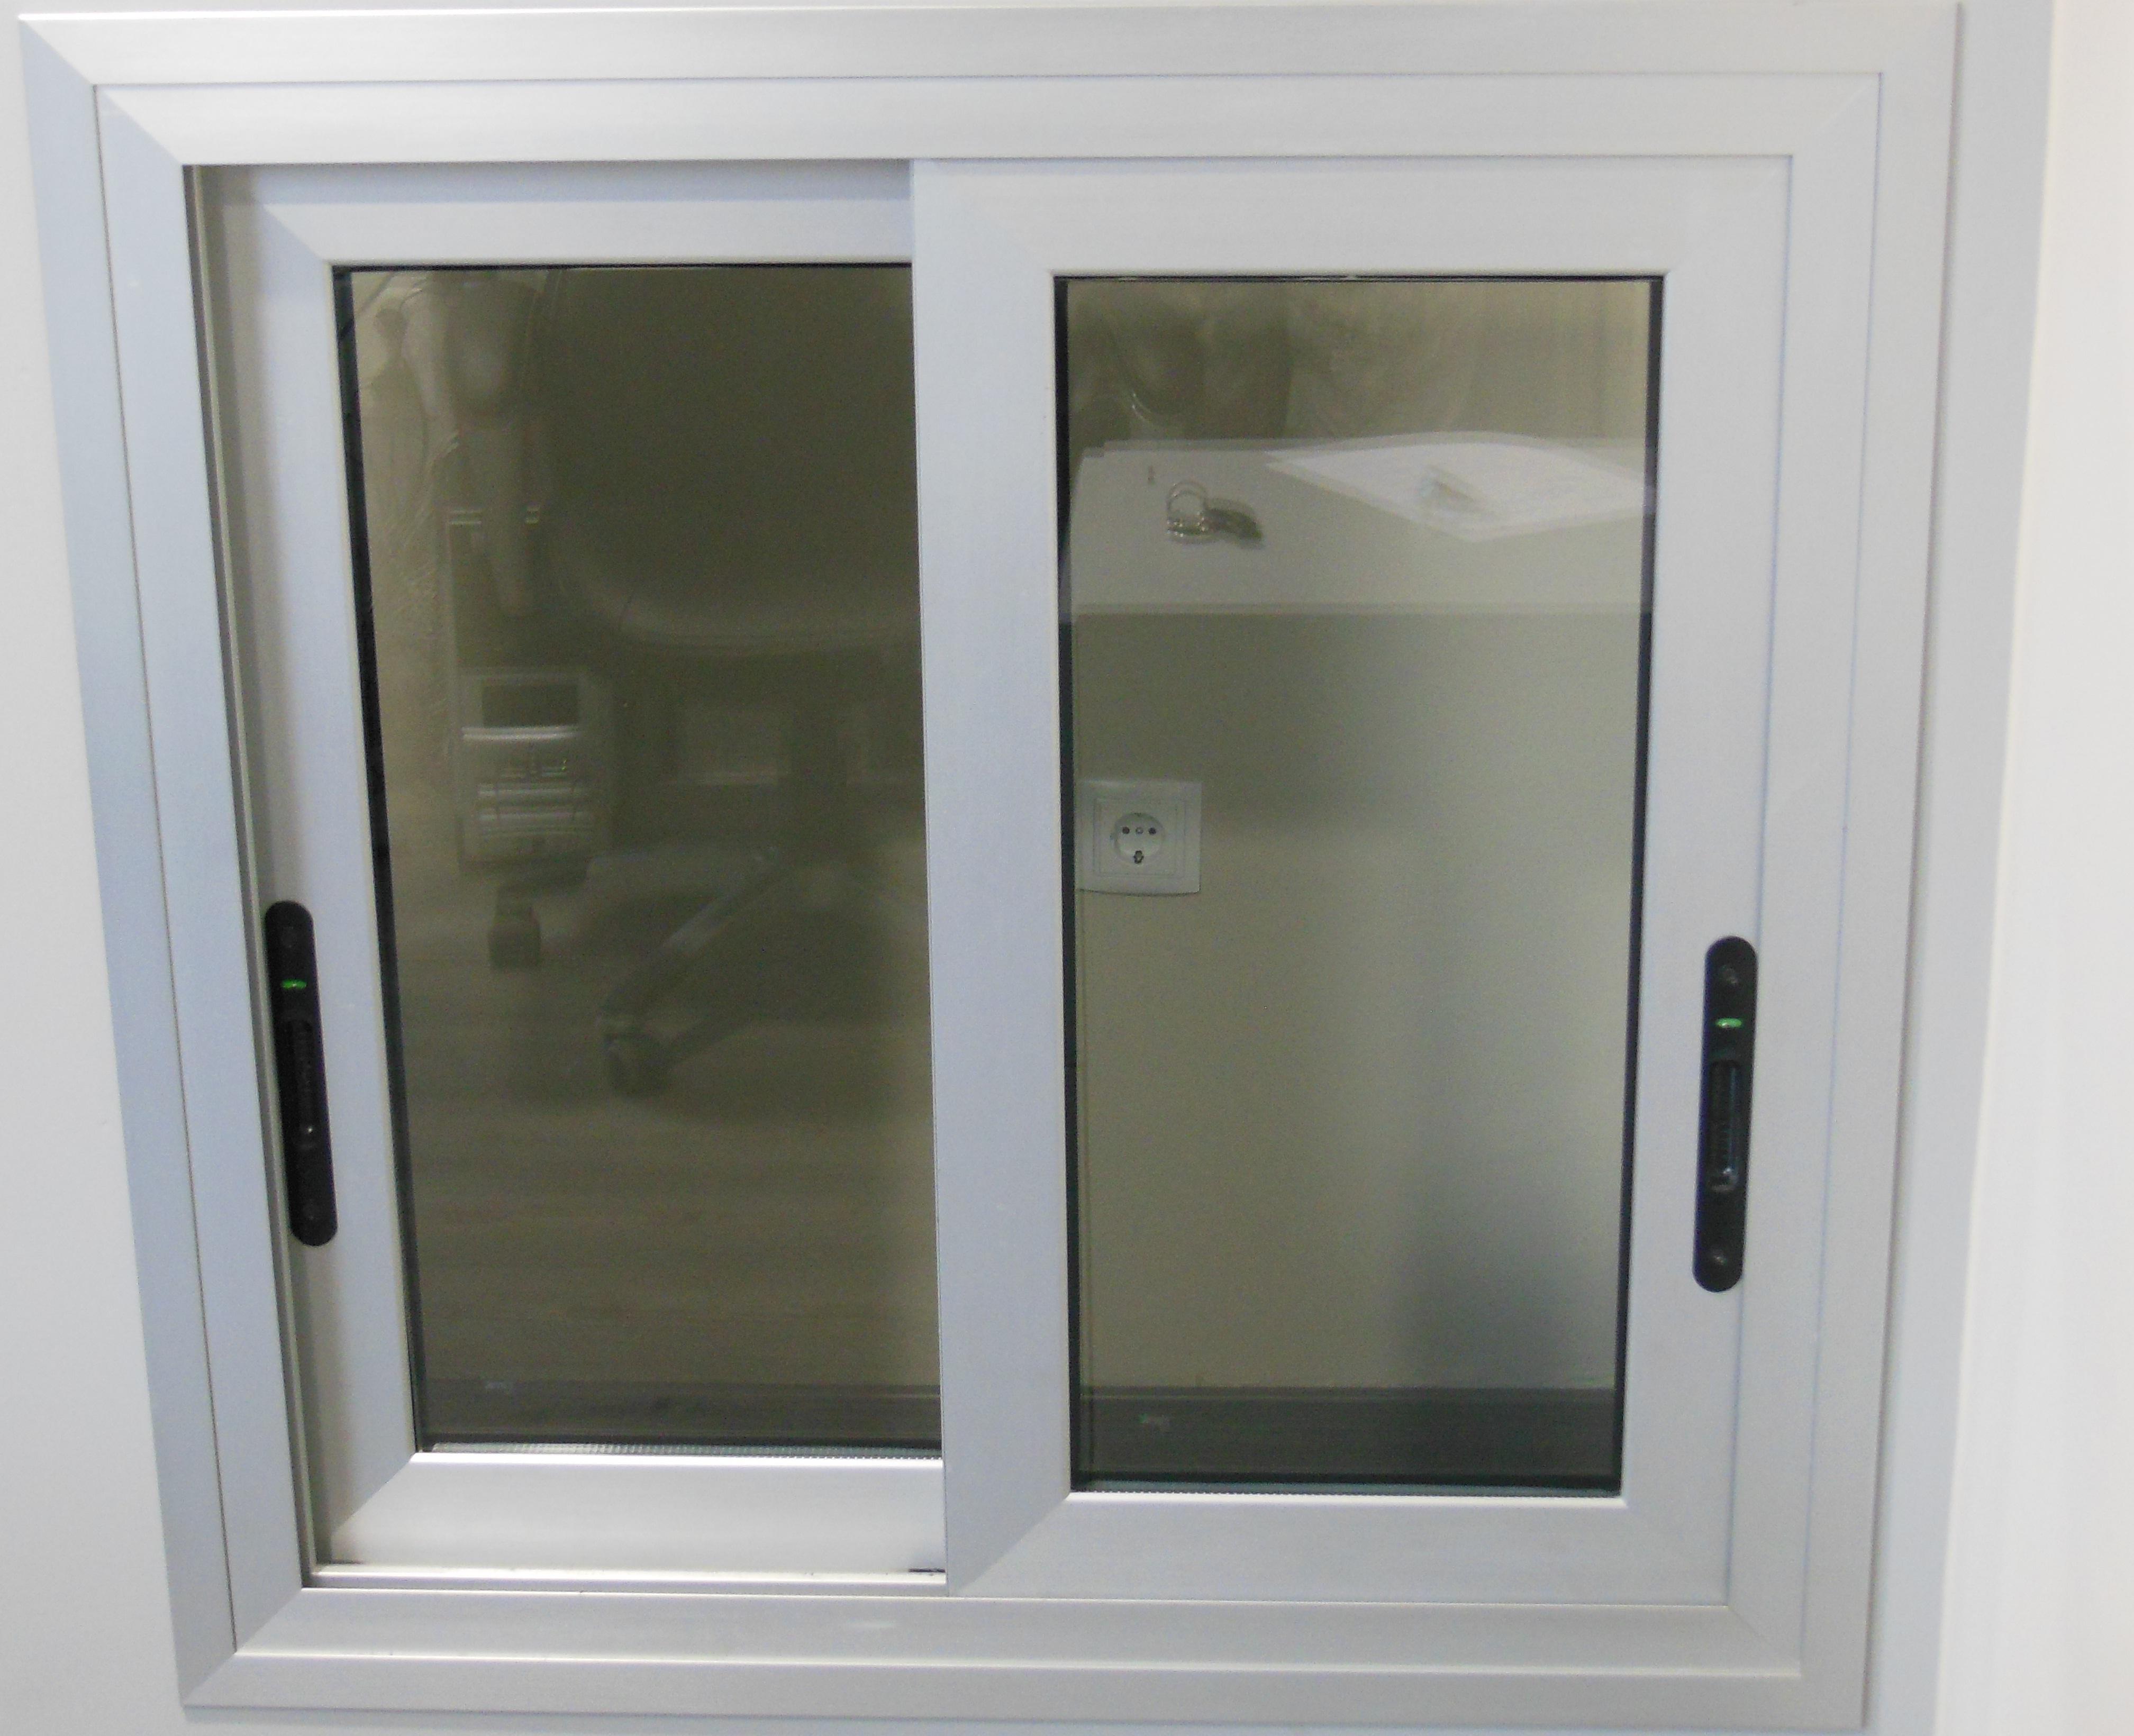 ventanas de aluminio montajes de aluminio dg On correderas de aluminio